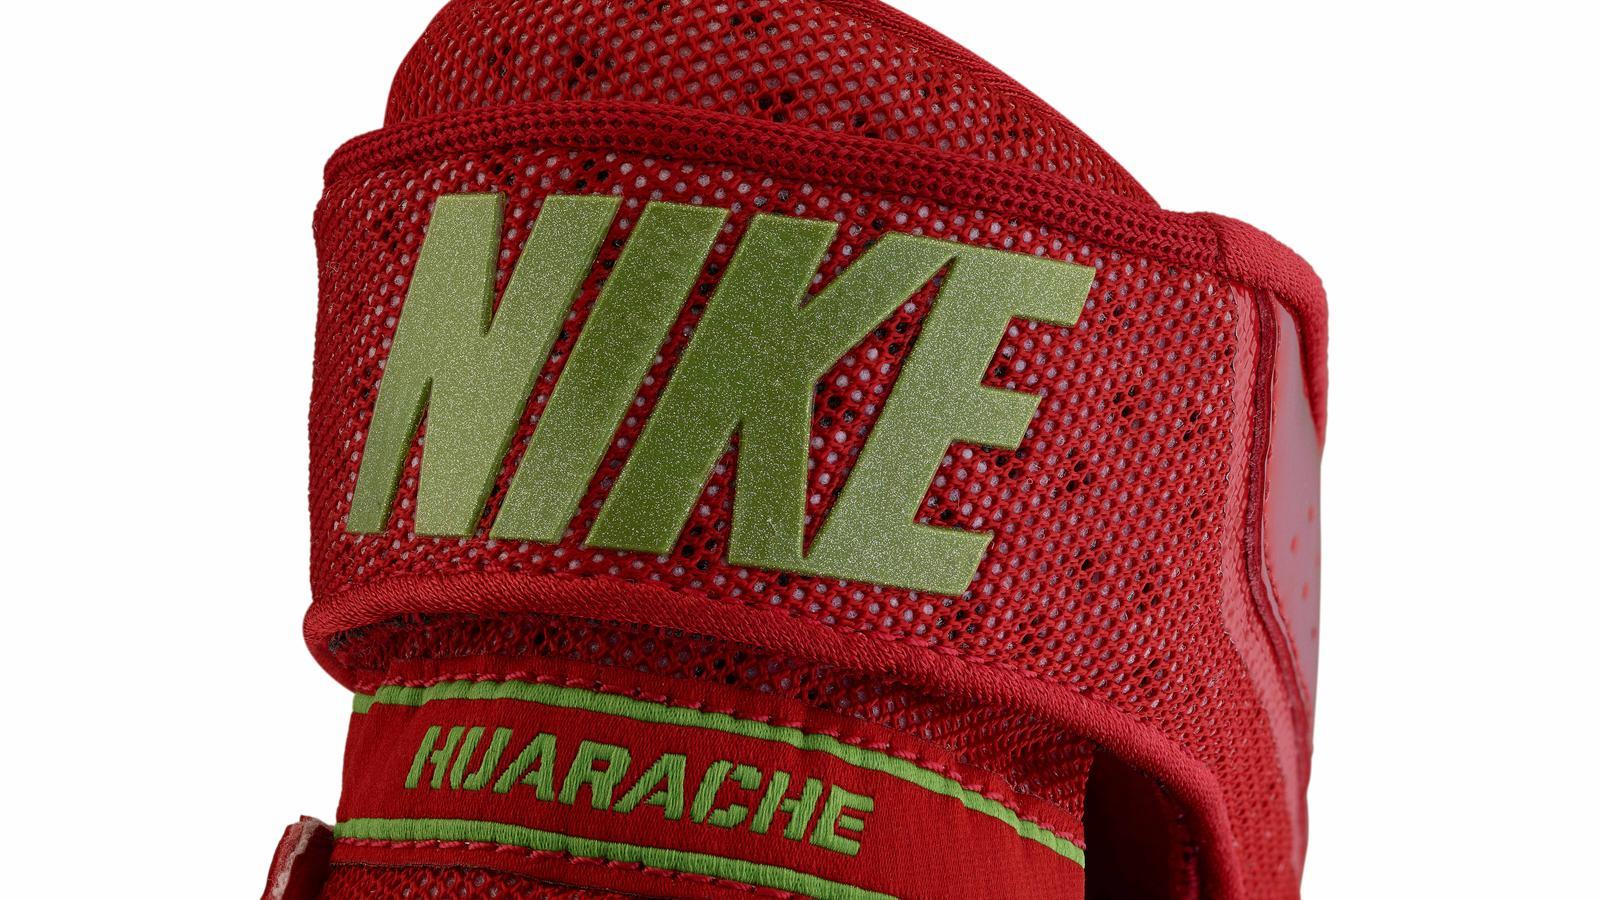 Hirachi Red Strap Detail